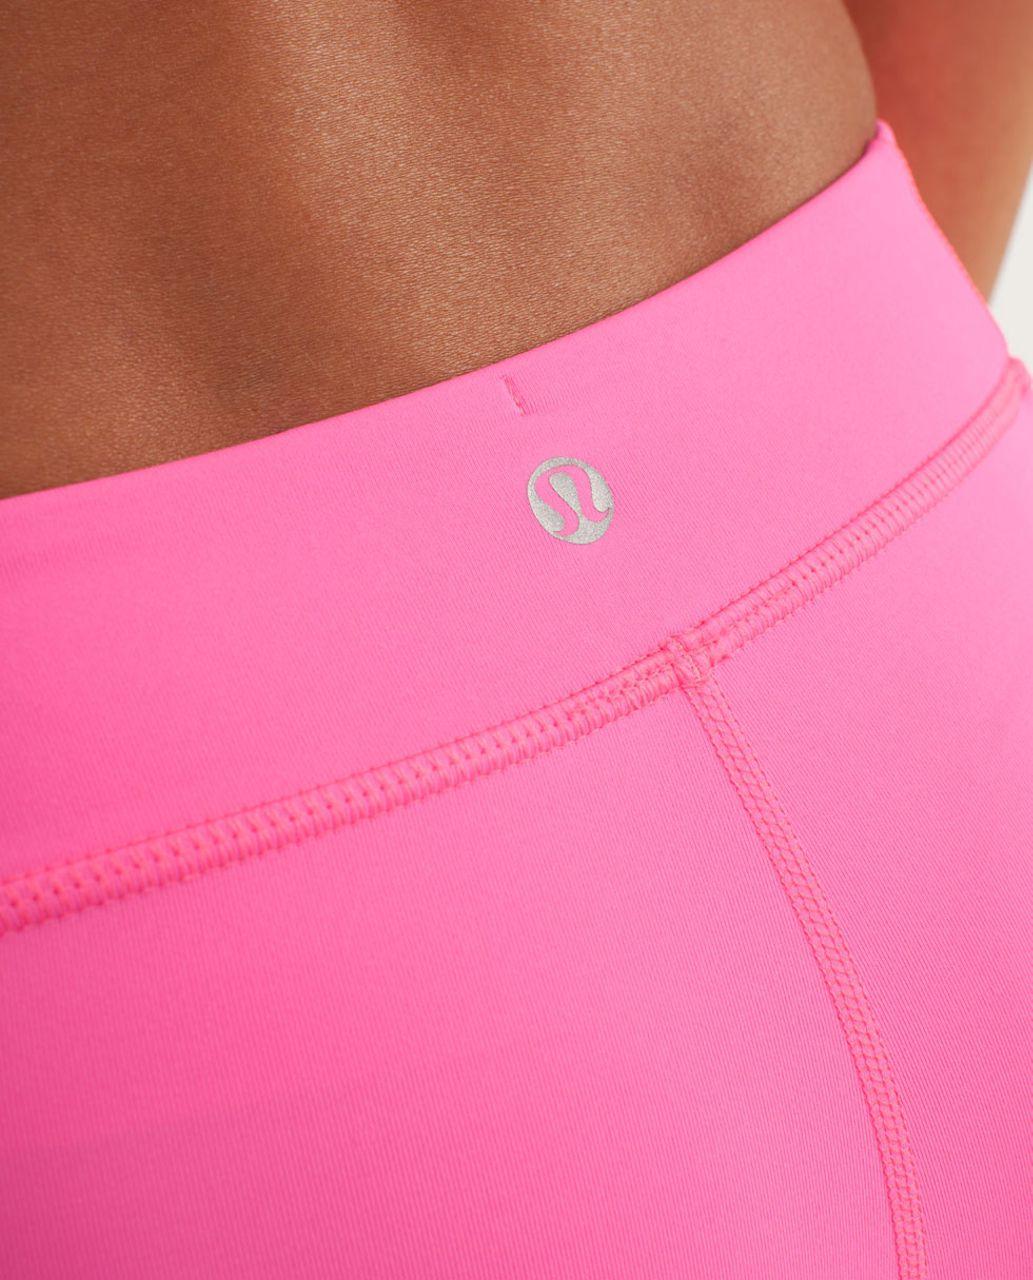 Lululemon Heat It Up Short - Pinkelicious / Parfait Pink